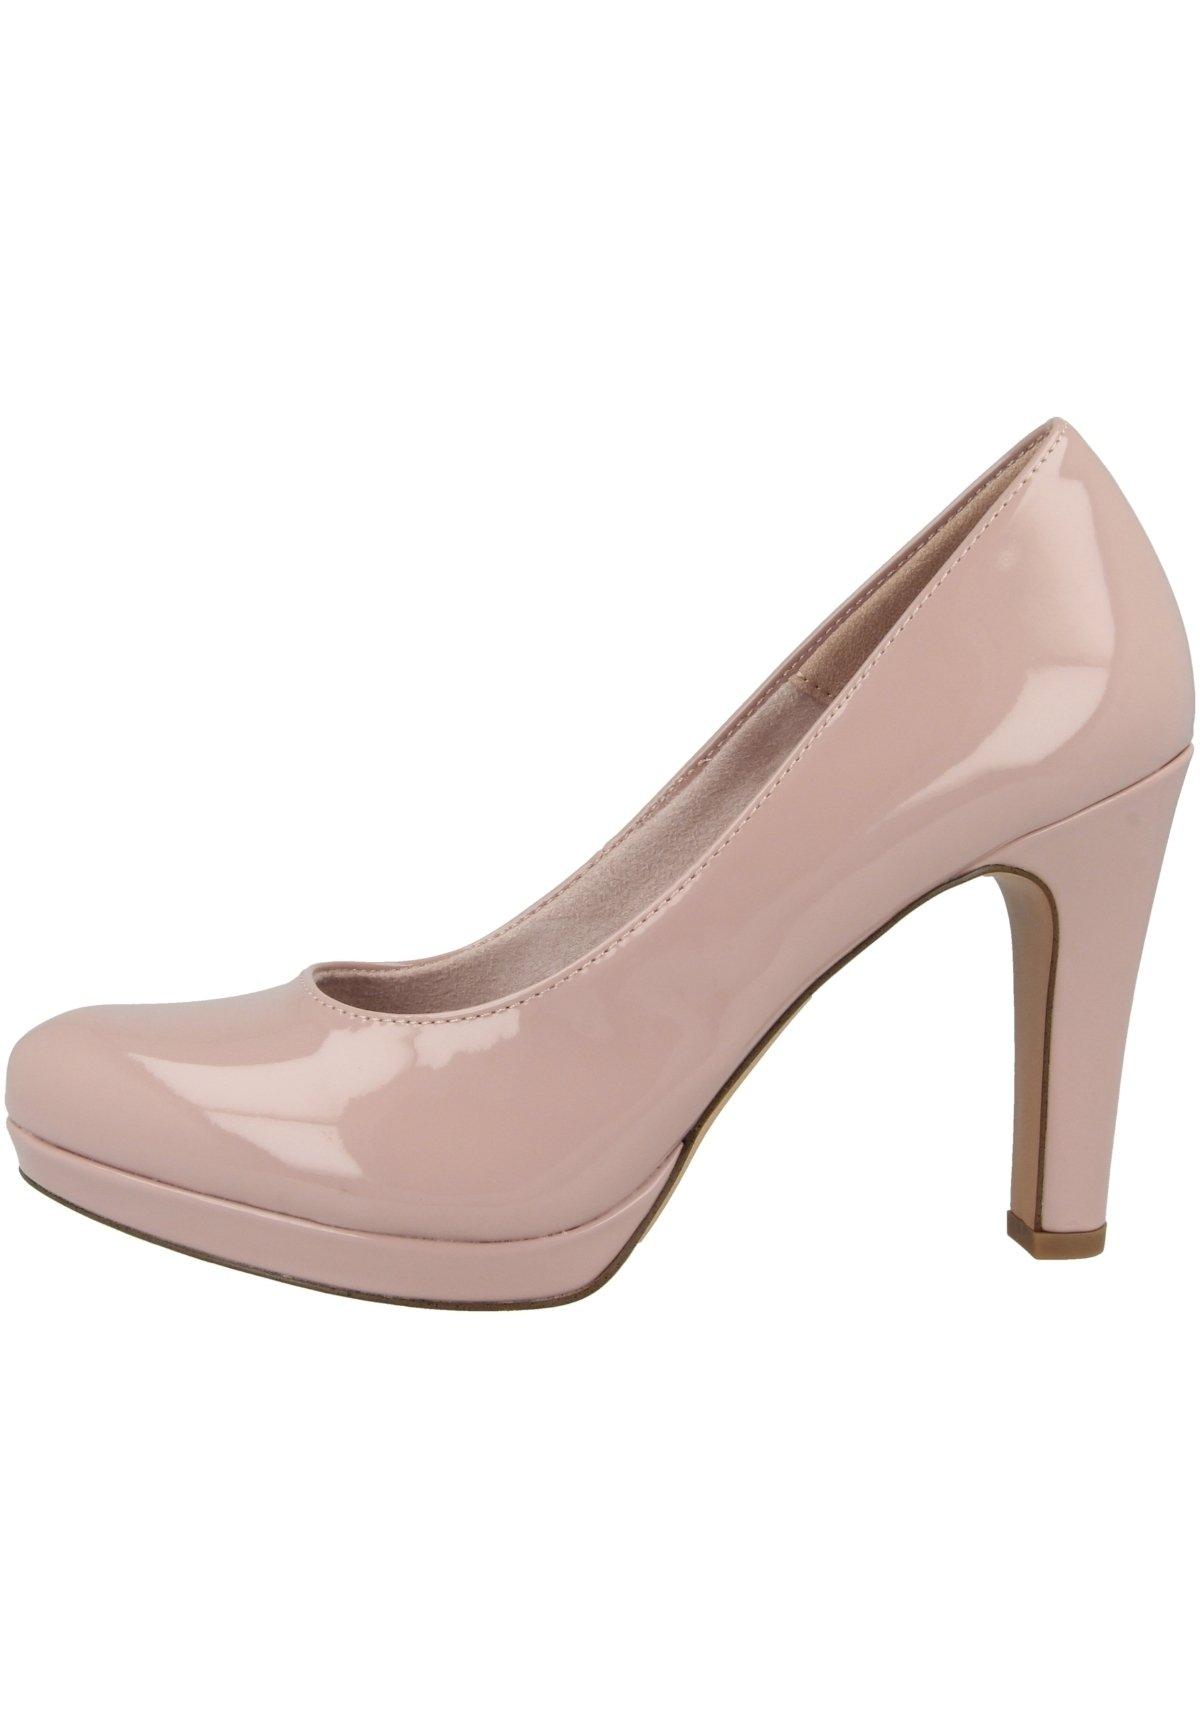 Damen High Heel Pumps - rose patent